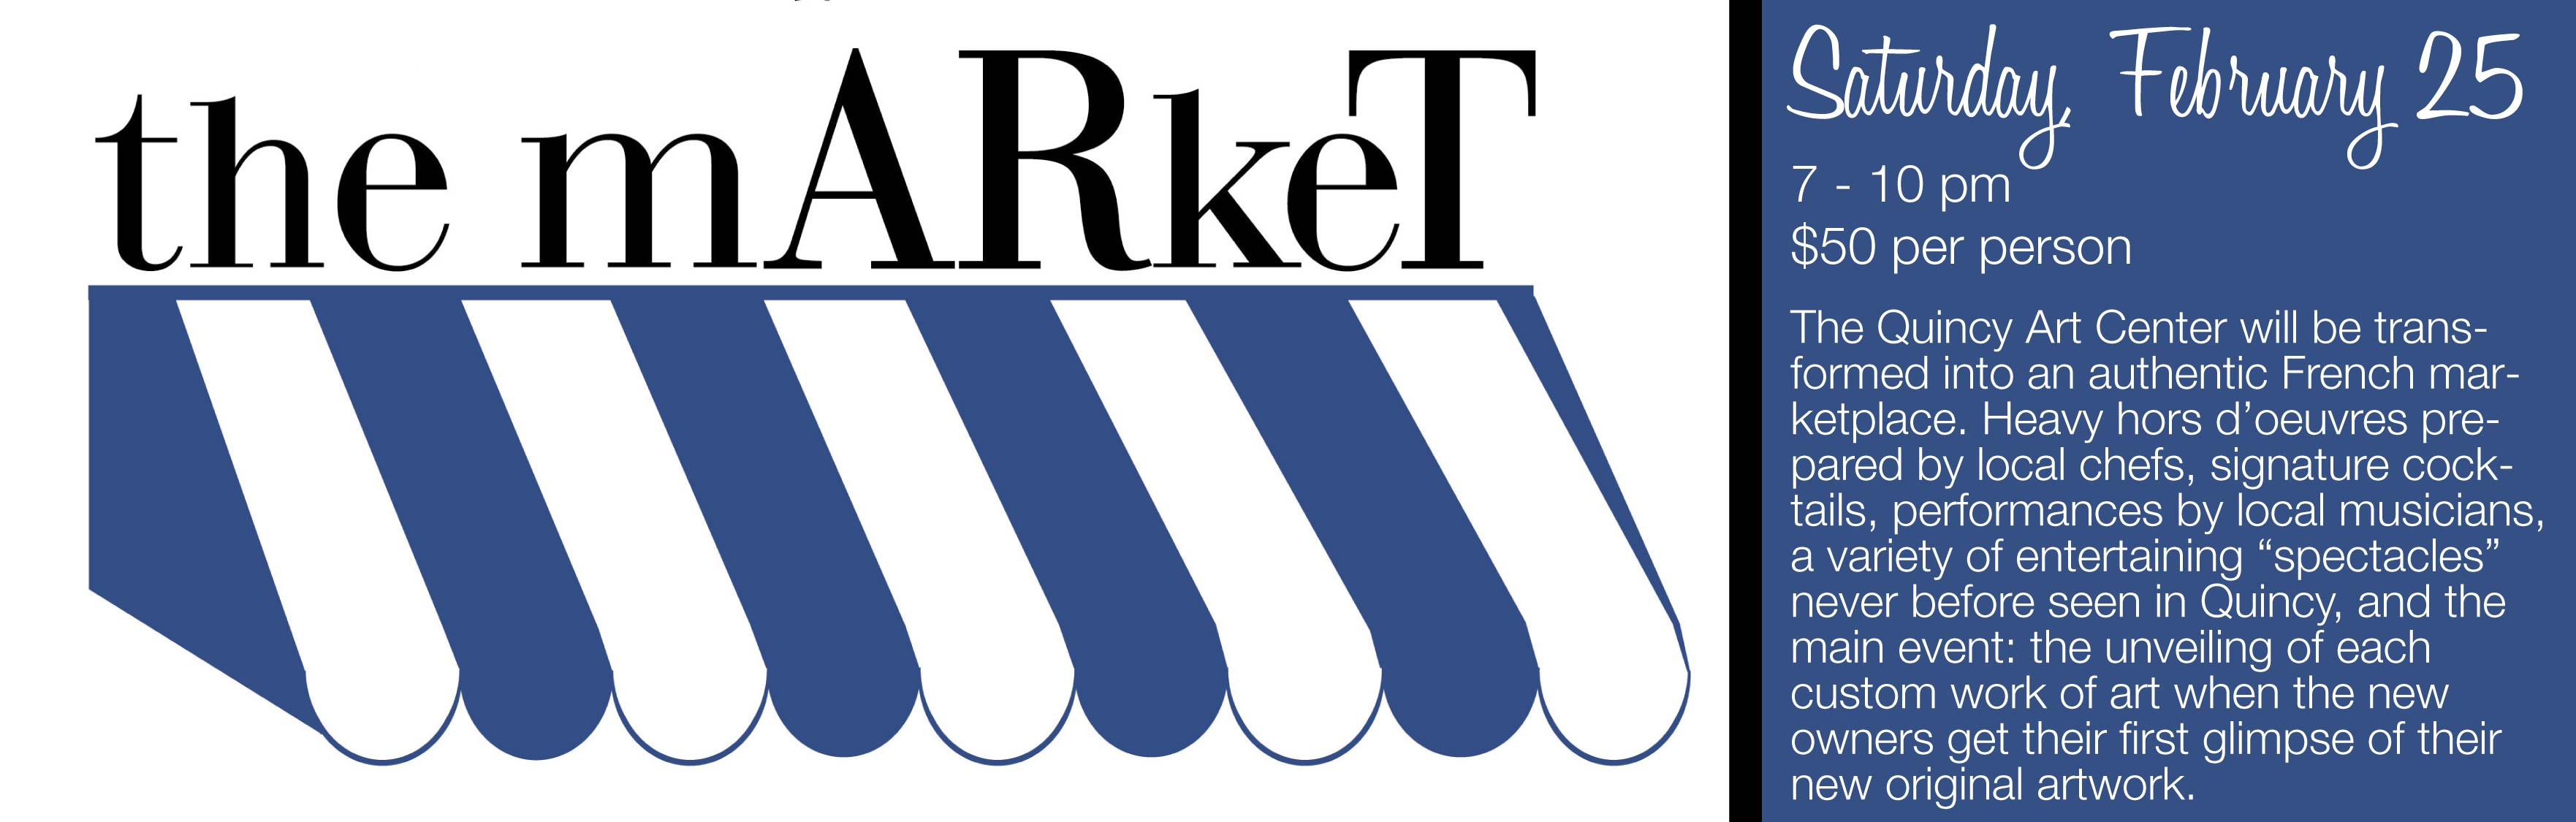 the mARket website header